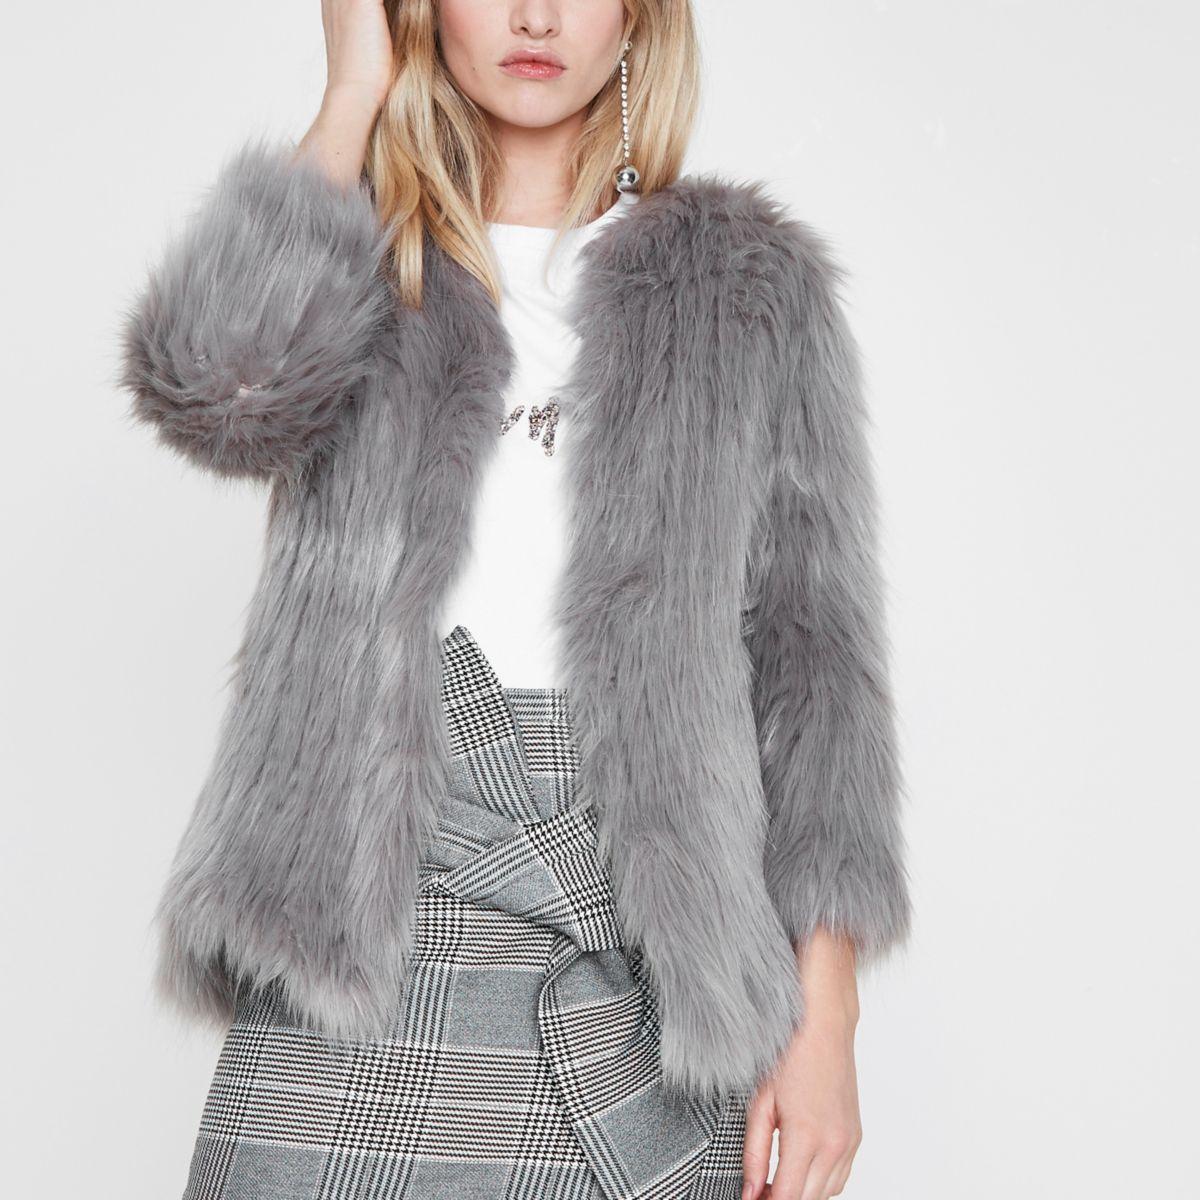 Light grey faux fur knit coat